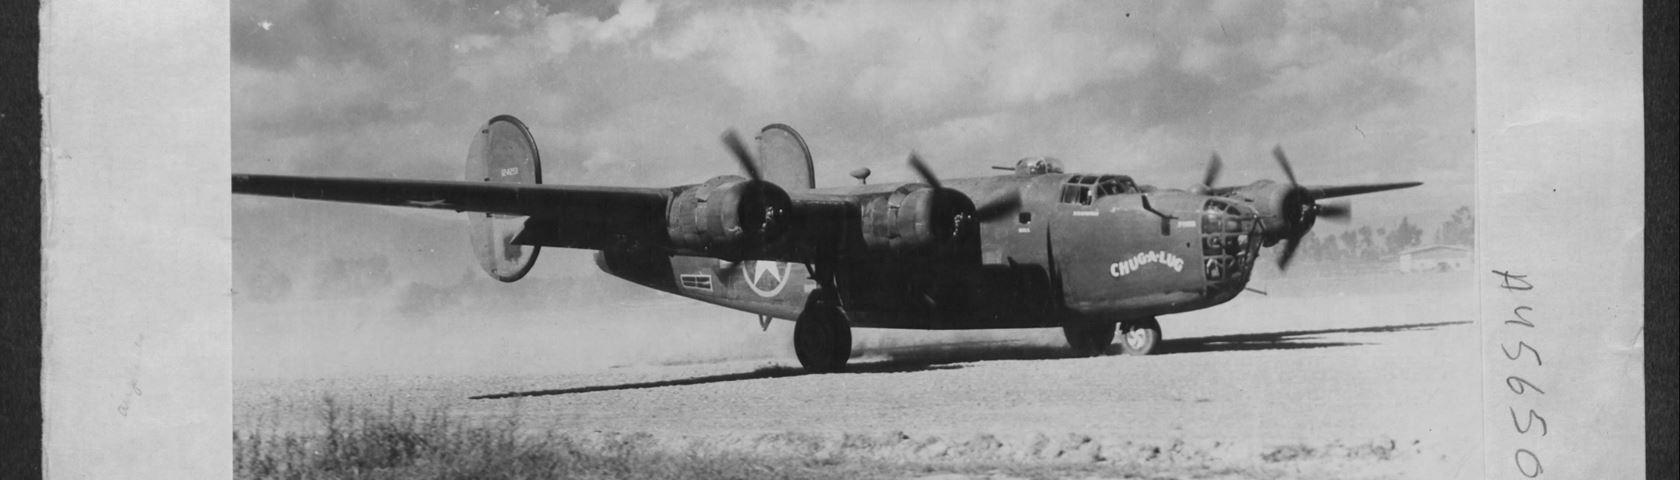 World War 2 Bomber